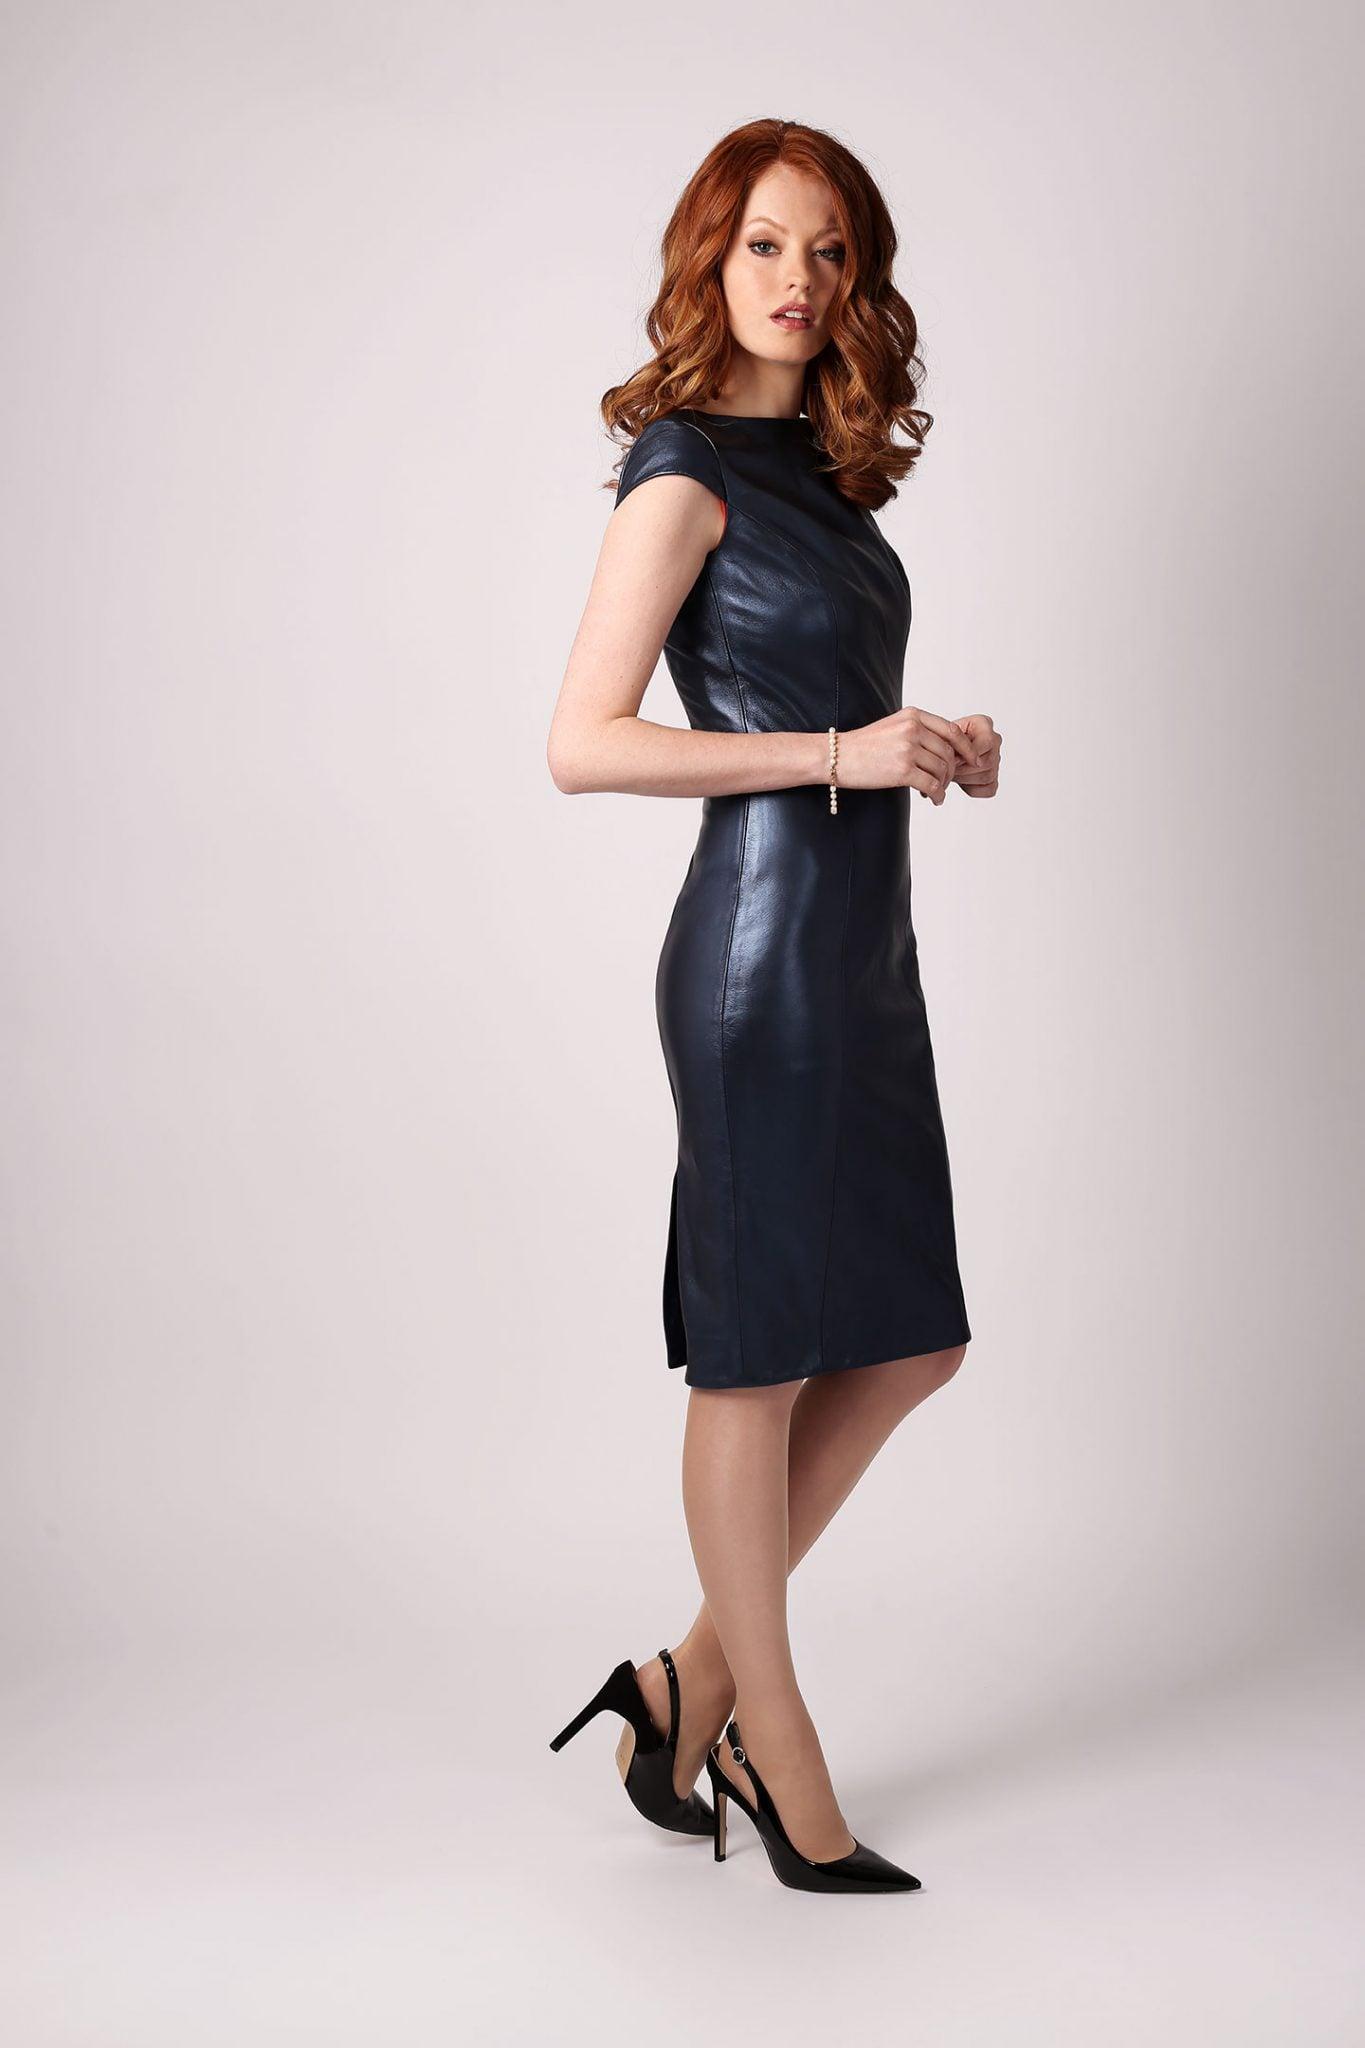 Petrol Blue Metallic Leather Dress1